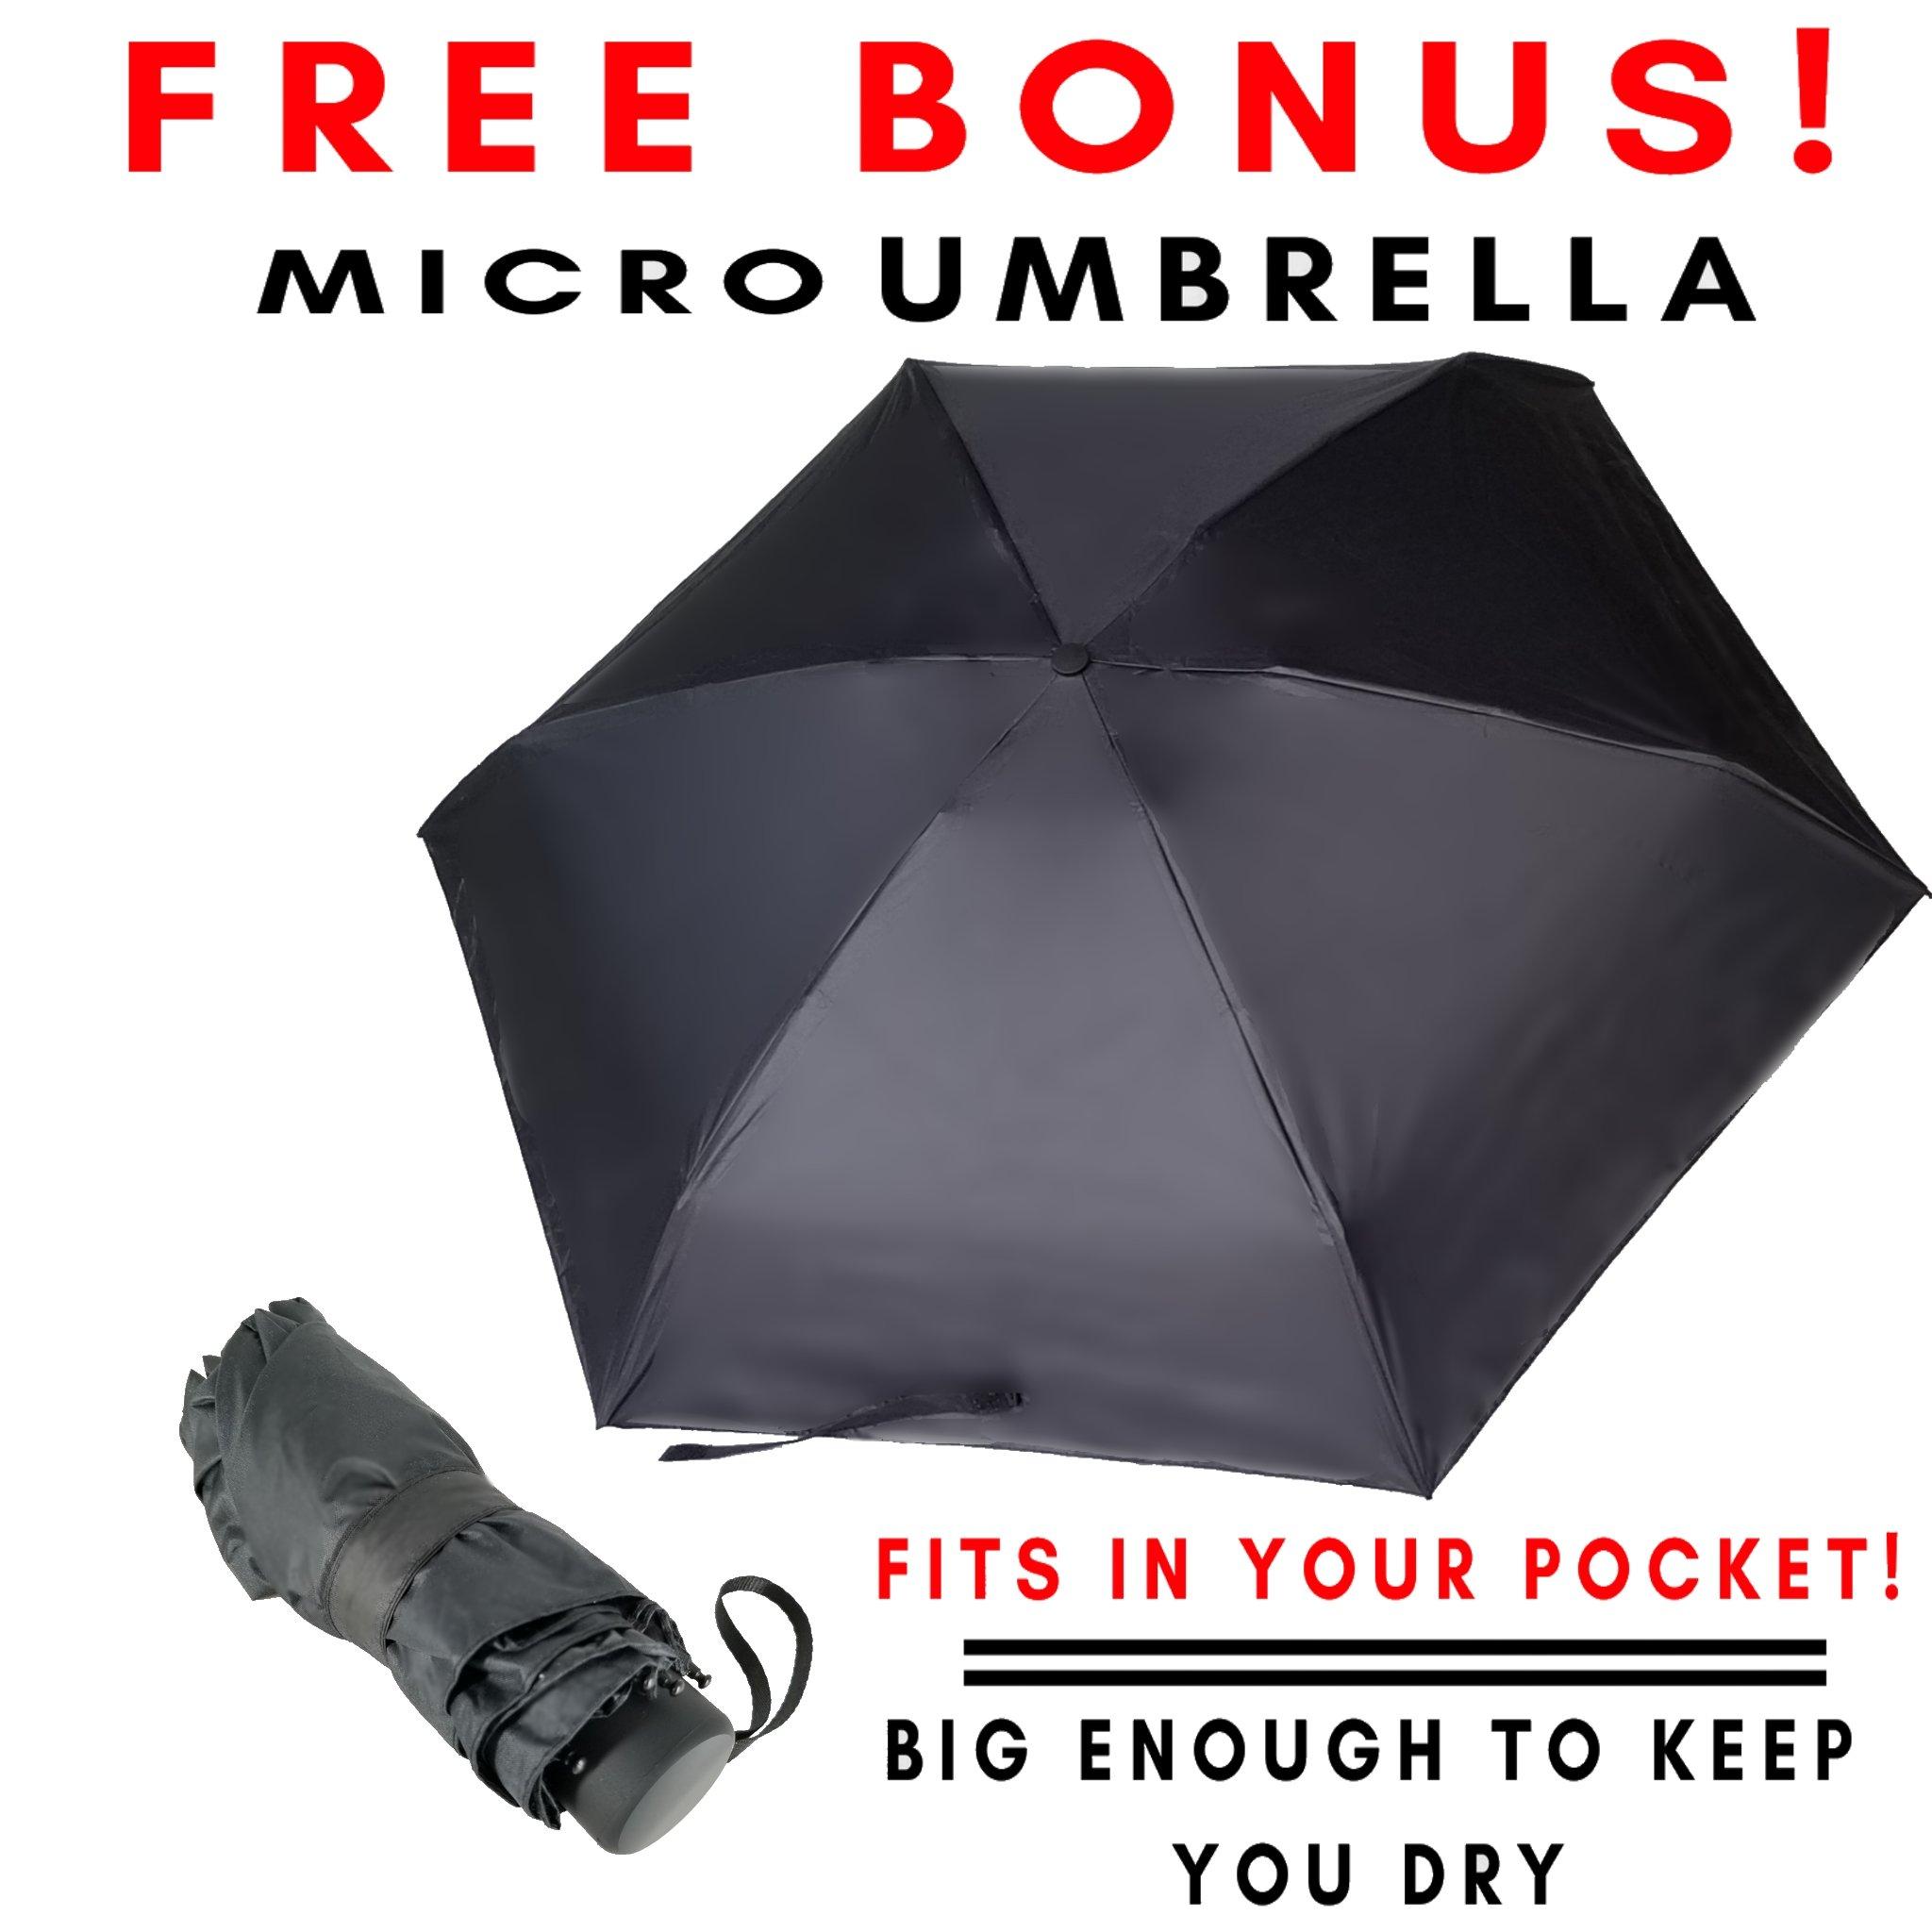 Compact Windproof Travel Umbrella -FREE Mini Black Umbrella- Katzendaügs 2pc Black by Katzendaügs Umbrella Co. (Image #5)